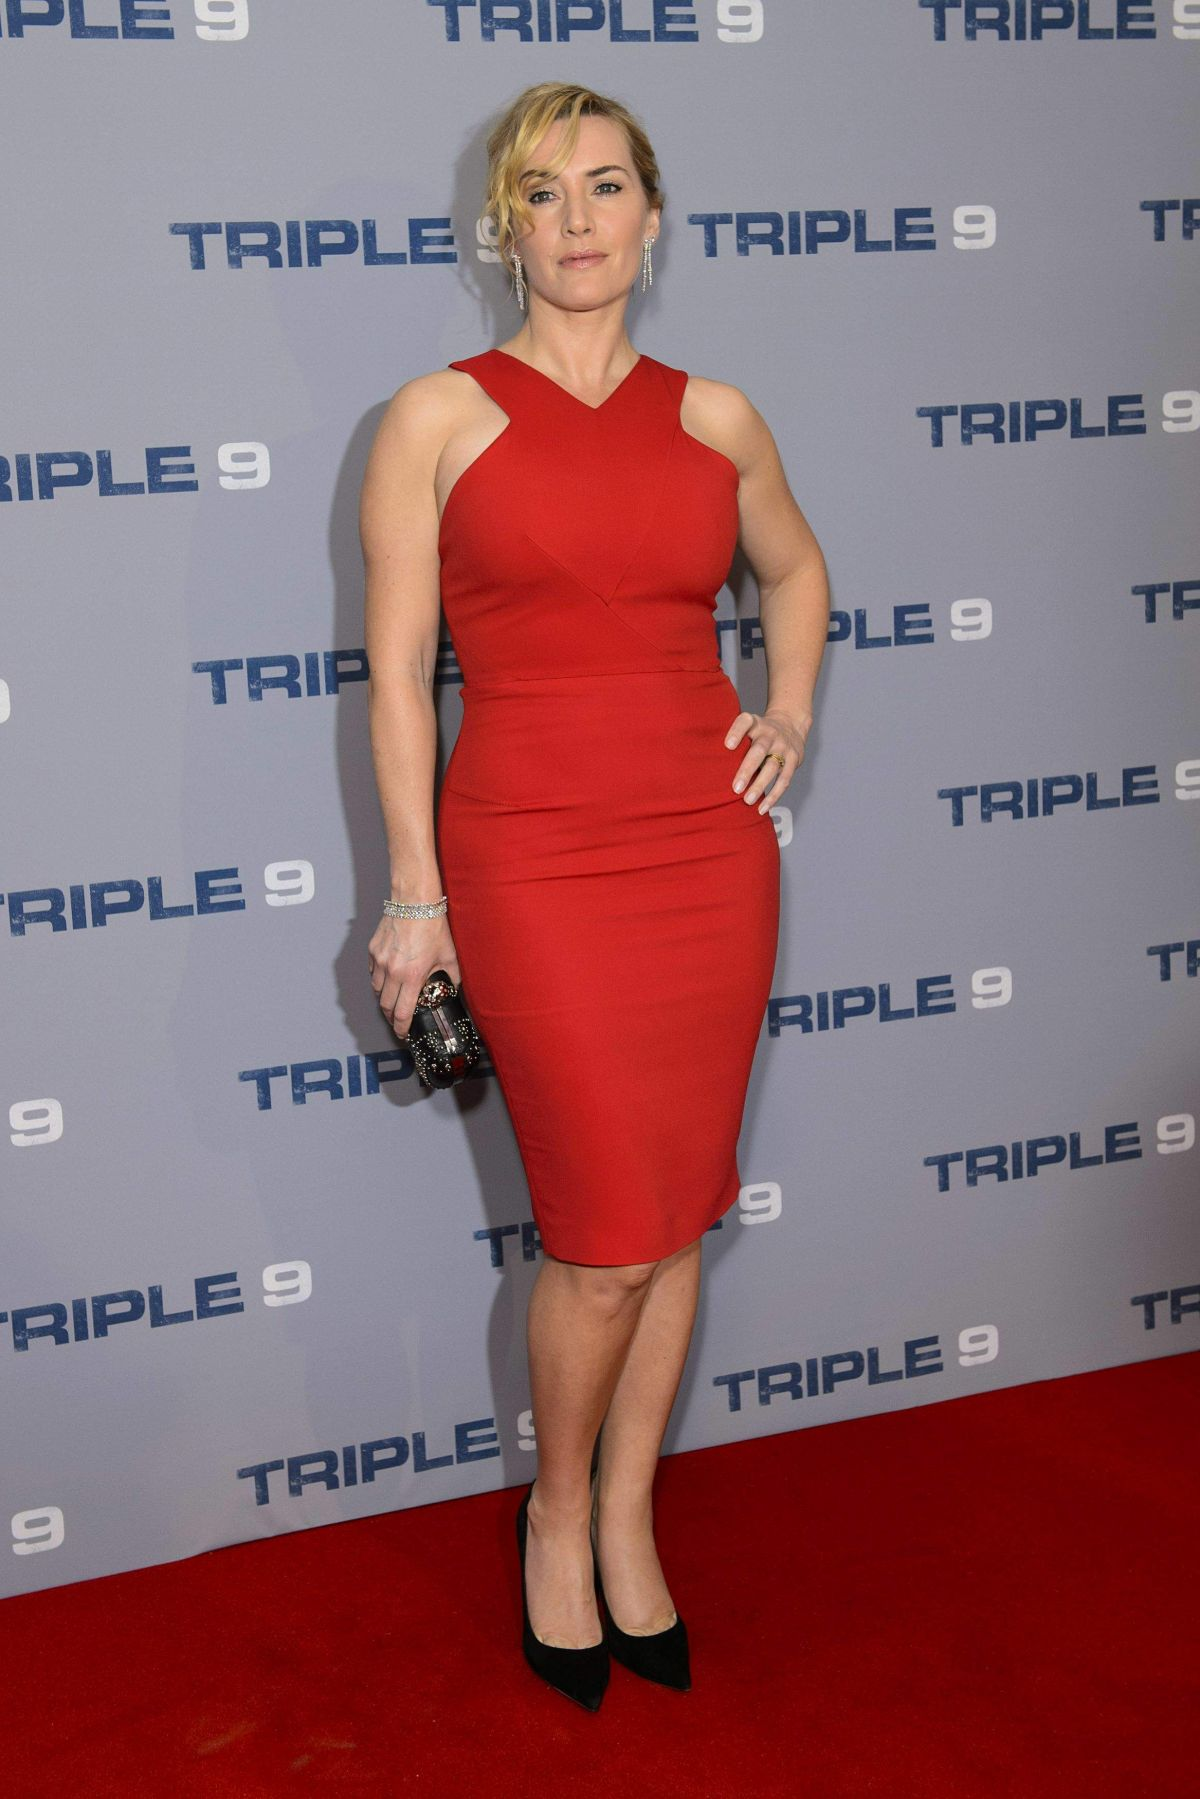 Kate Winslet Archives - HawtCelebs - HawtCelebs Kate Winslet